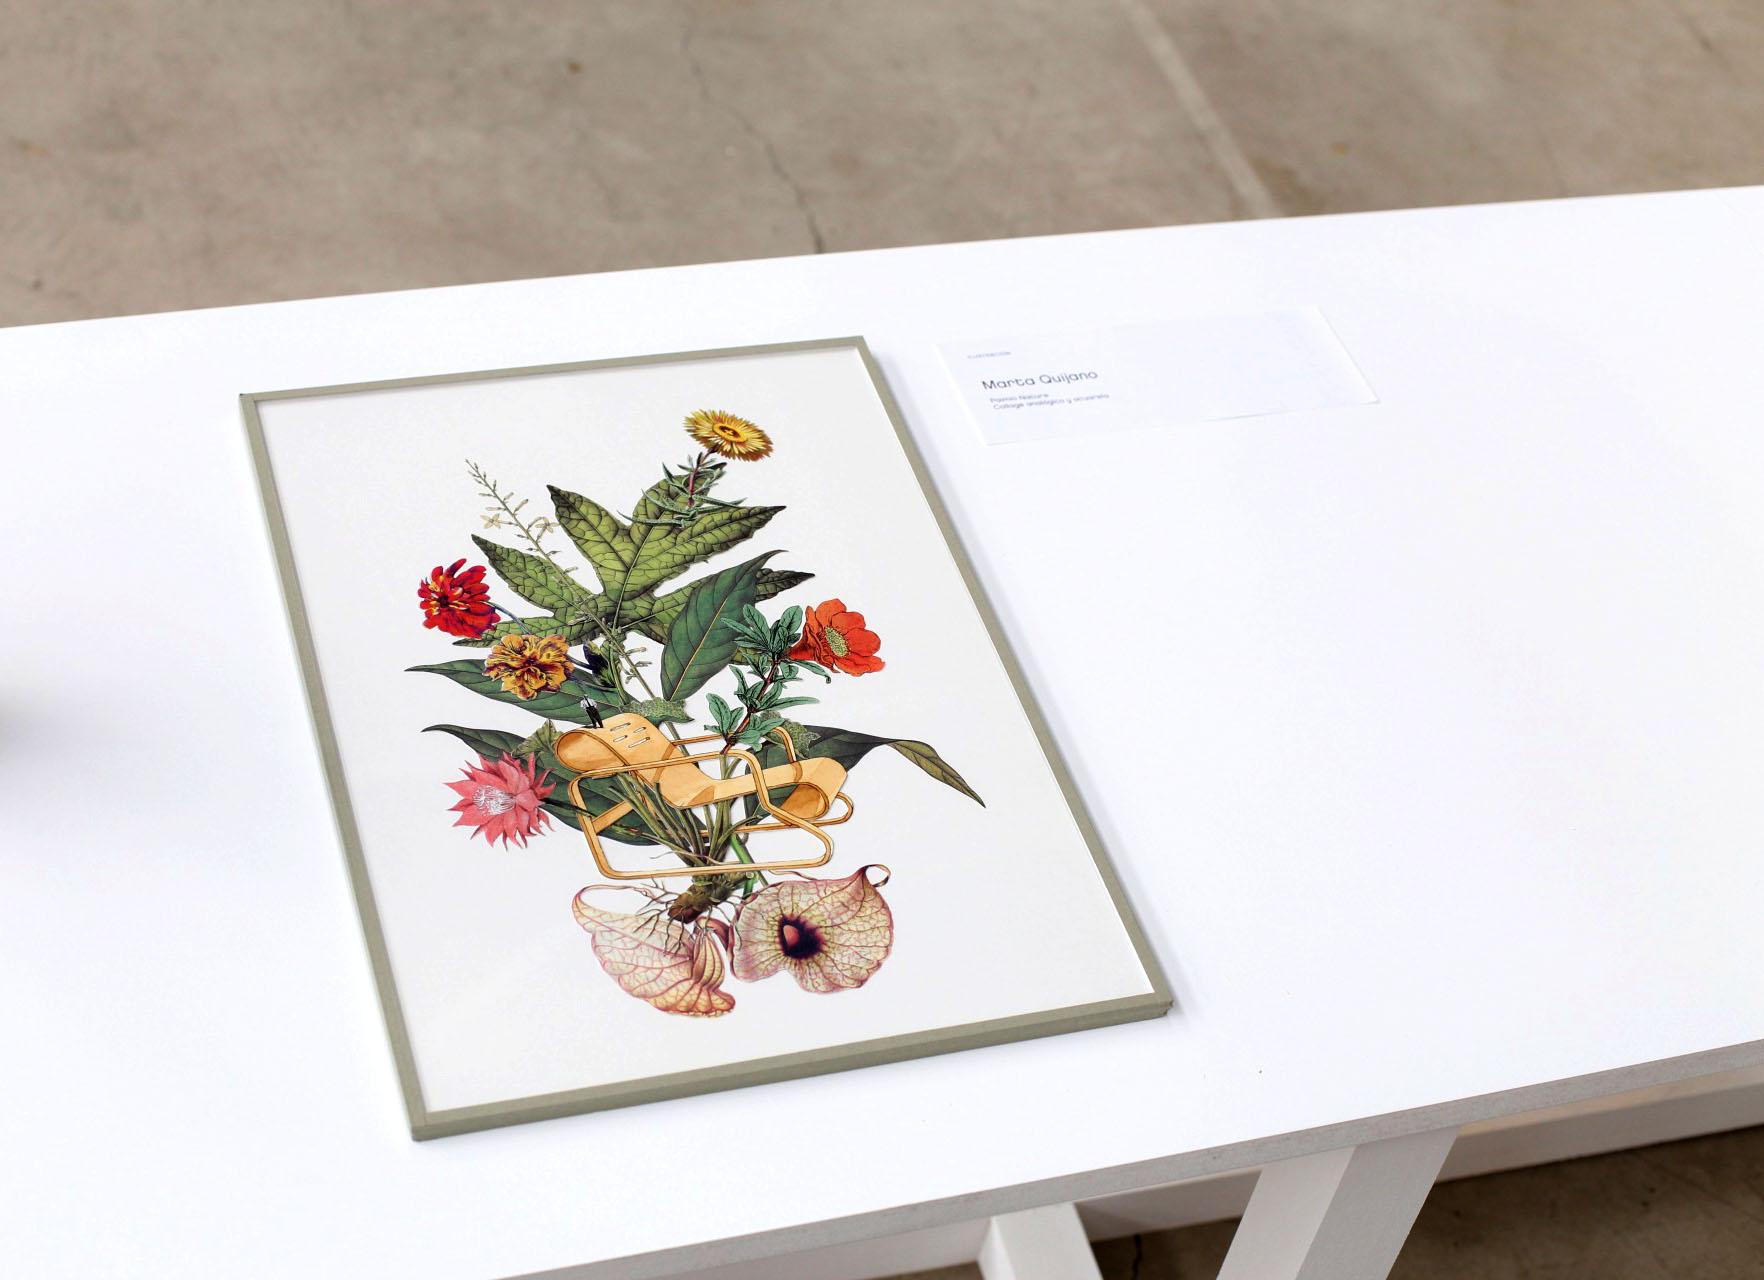 Art Skills 2018 Convocatoria Expositiva